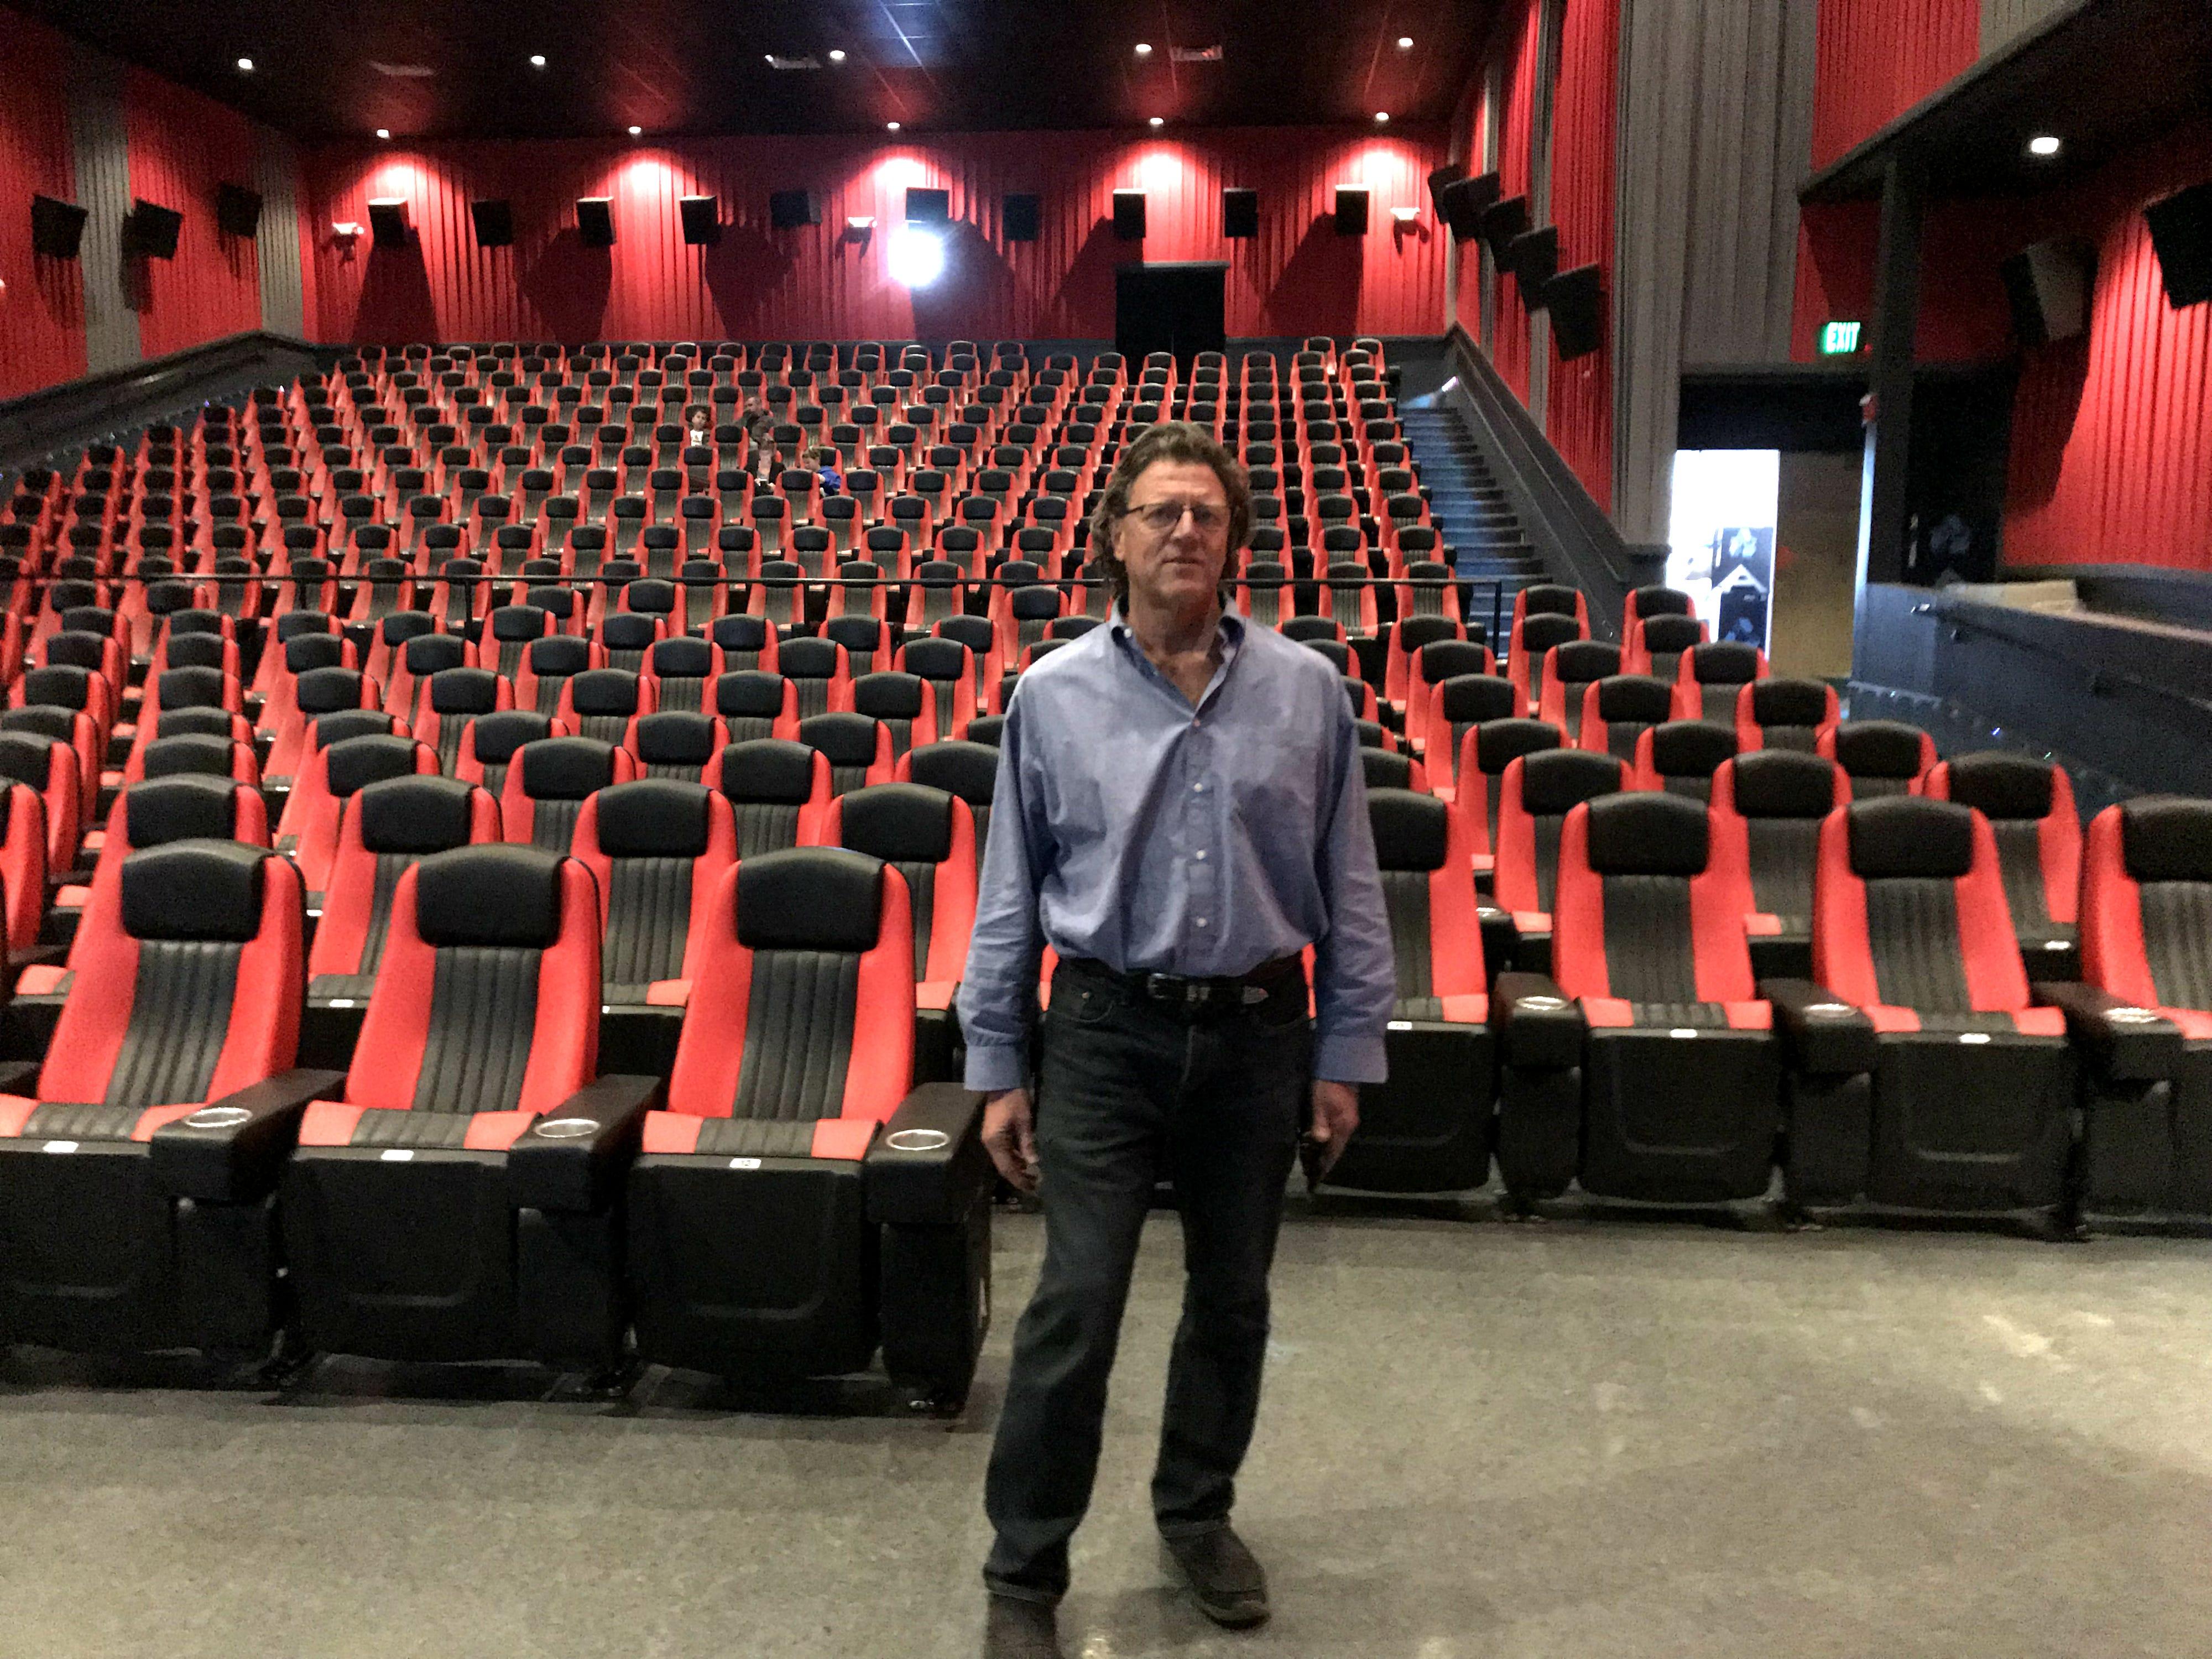 Essex developer re-imagines T-Rex Theater as concert venue, tables residential project | Burlington Free Press